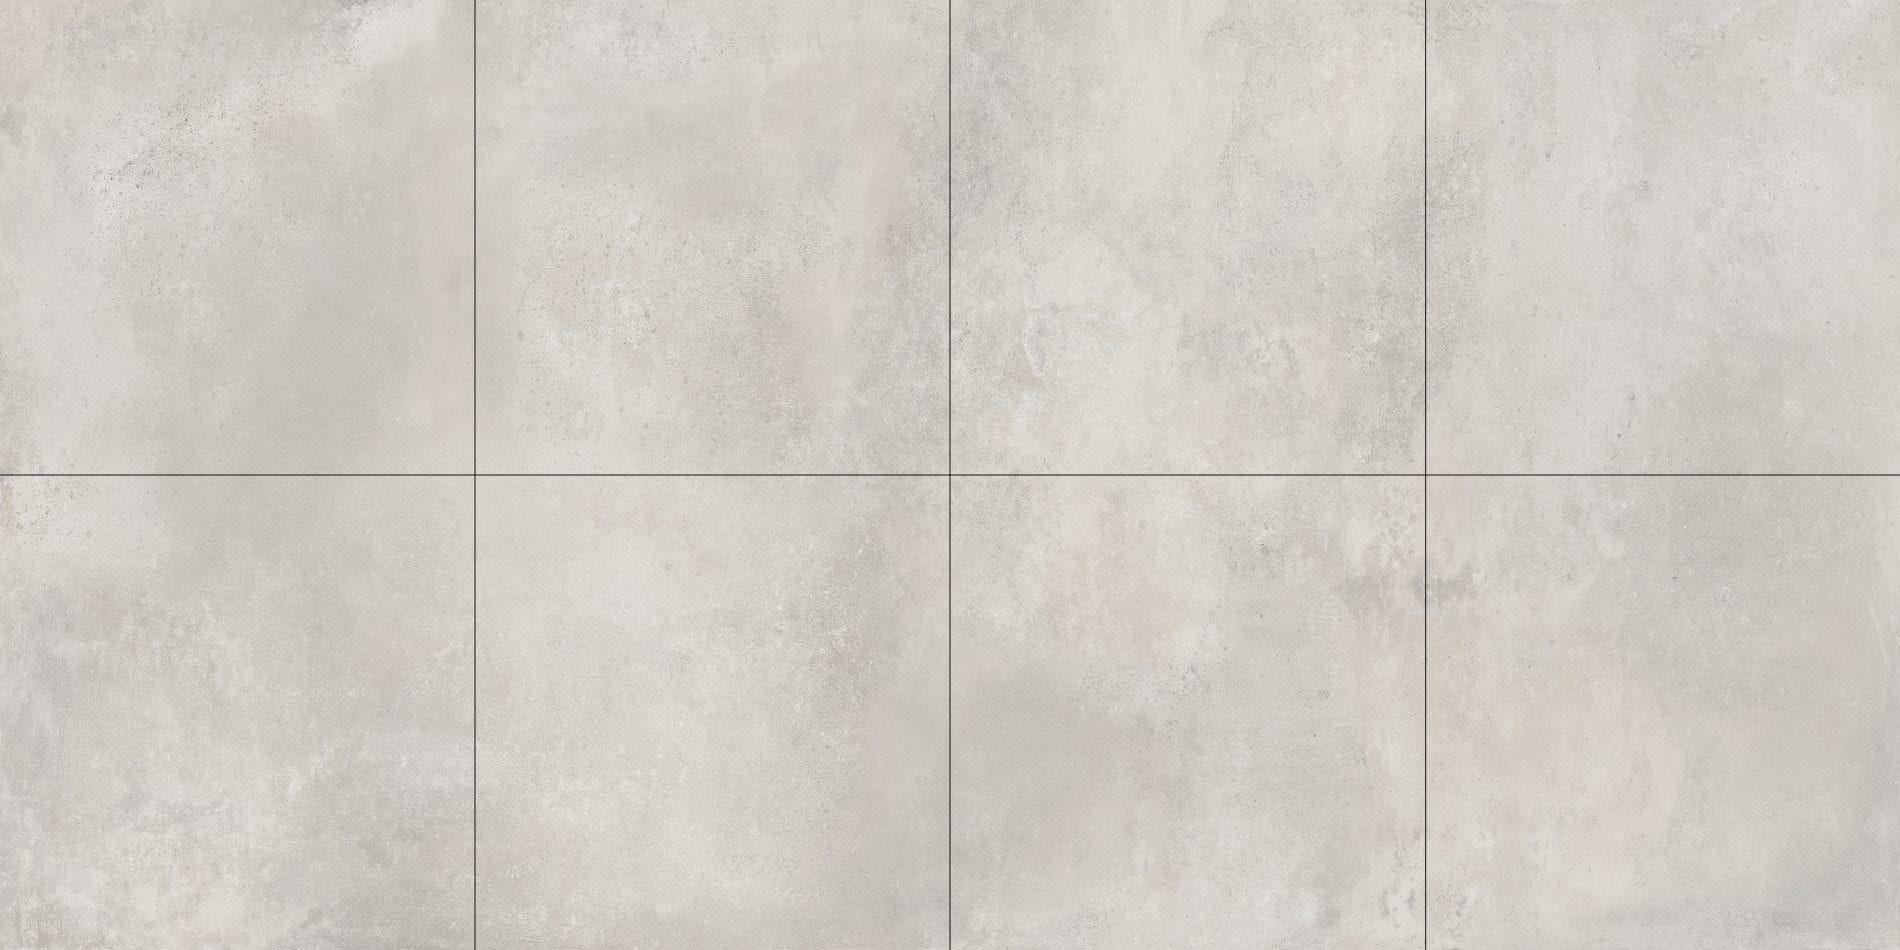 Shower Floor Hard To Clean Bianco Carrara Marble Herringbone Mosaics Traditional Bat Traditional Bathroom Tile Tile Bathroom Marble Backsplash Bathroom